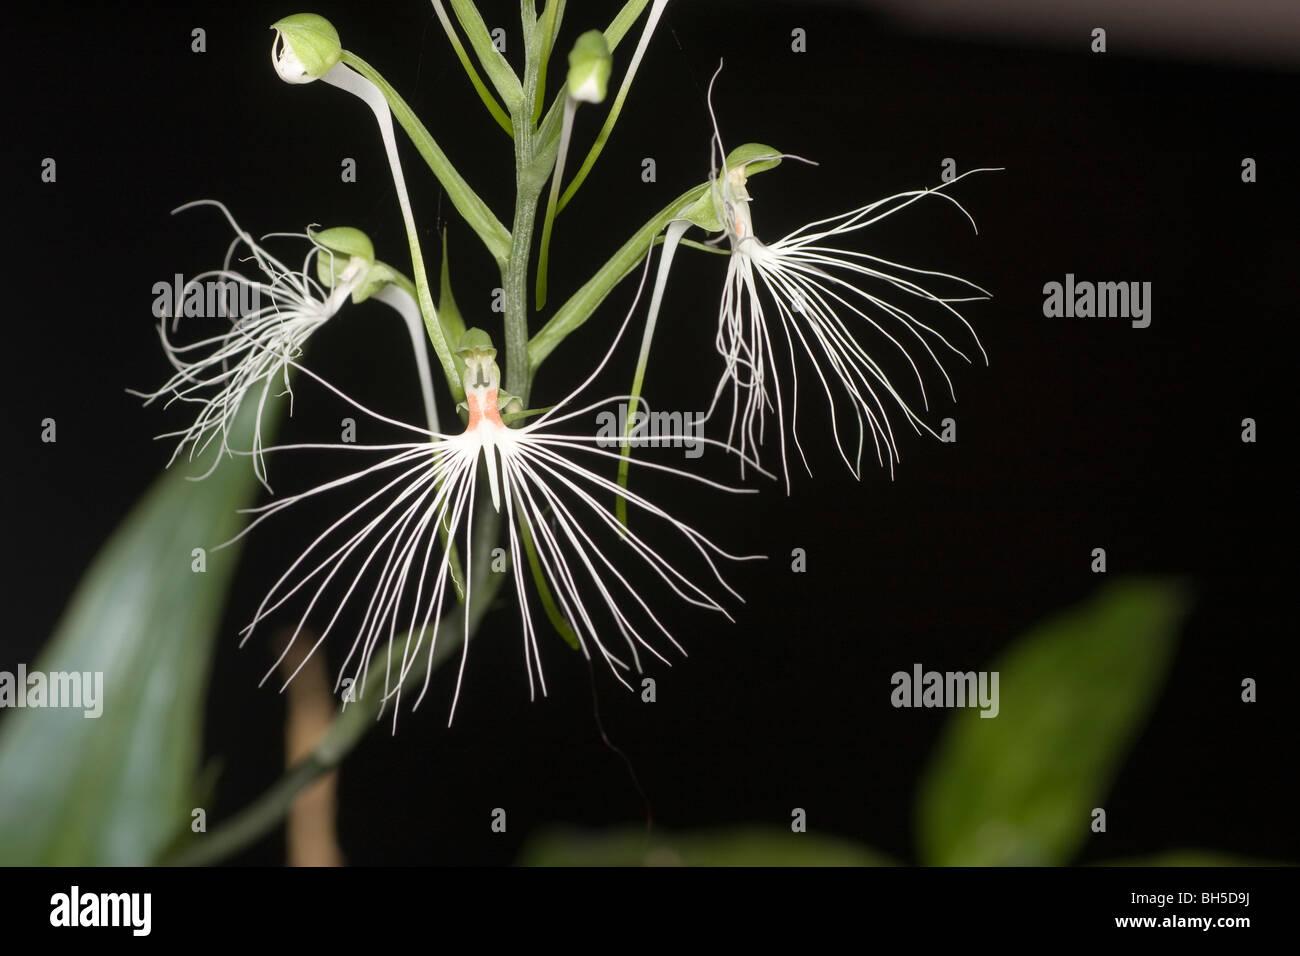 Habenaria medusa syn. Habenaria myriotricha flowers and buds endemic  to Java, Sumatra, Sulawesi  and Borneo. Stock Photo